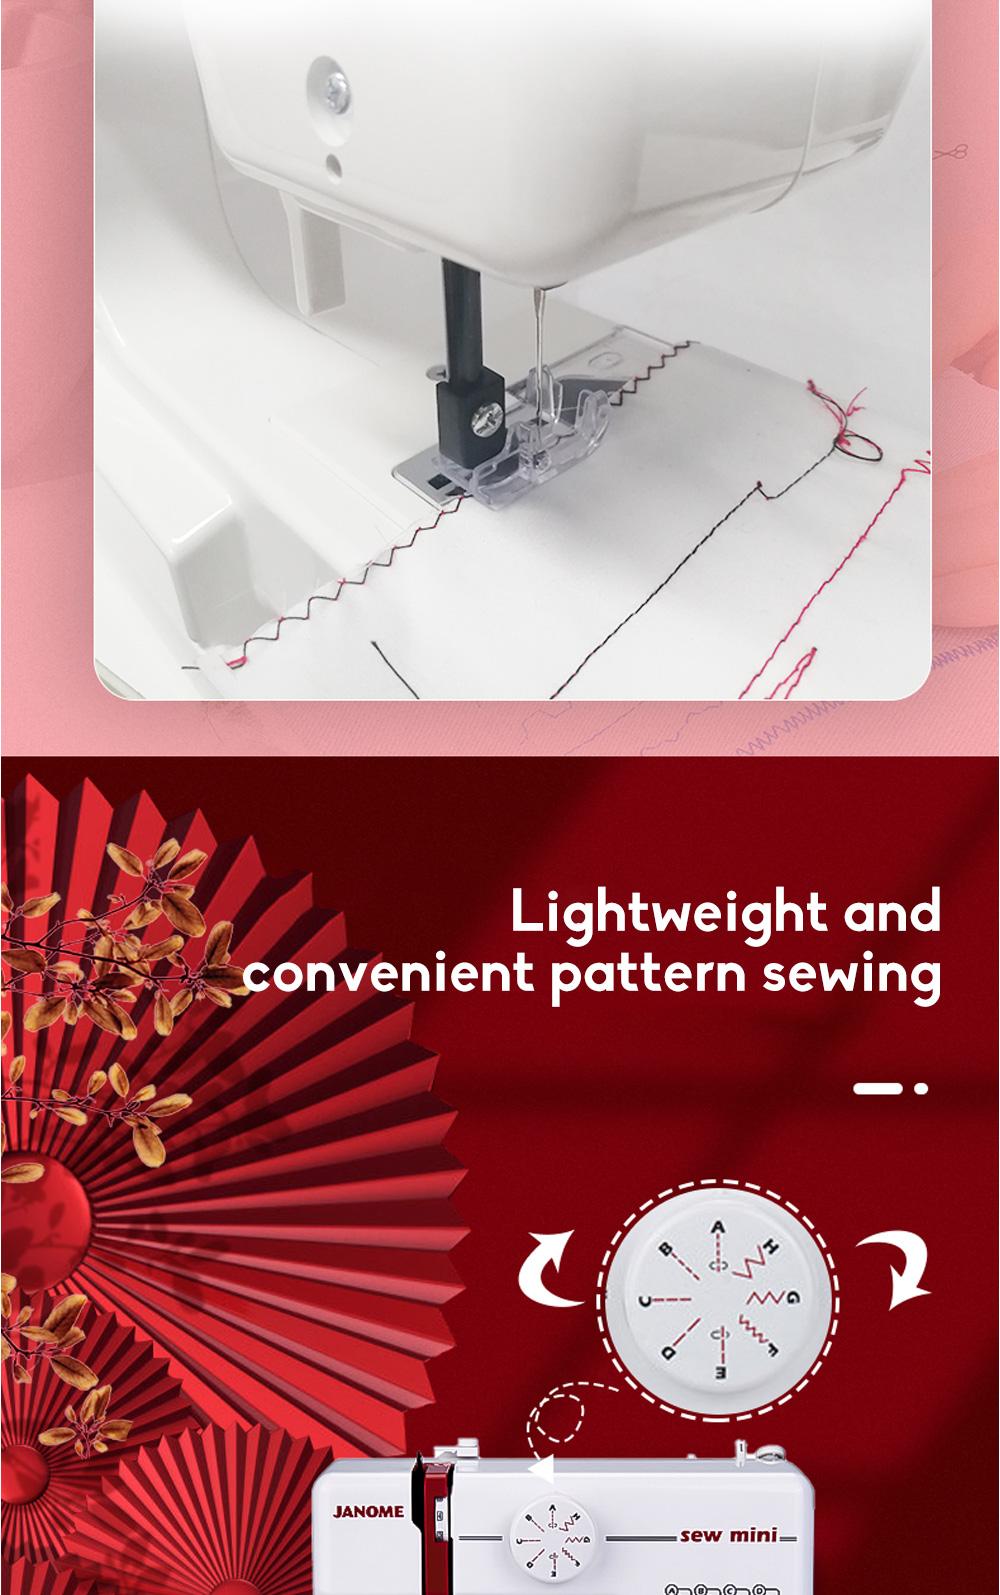 JANOME Electric Desktop Mini Home Sewing Machine Micro Bike Thick Multifunctional Manual Sewing  3